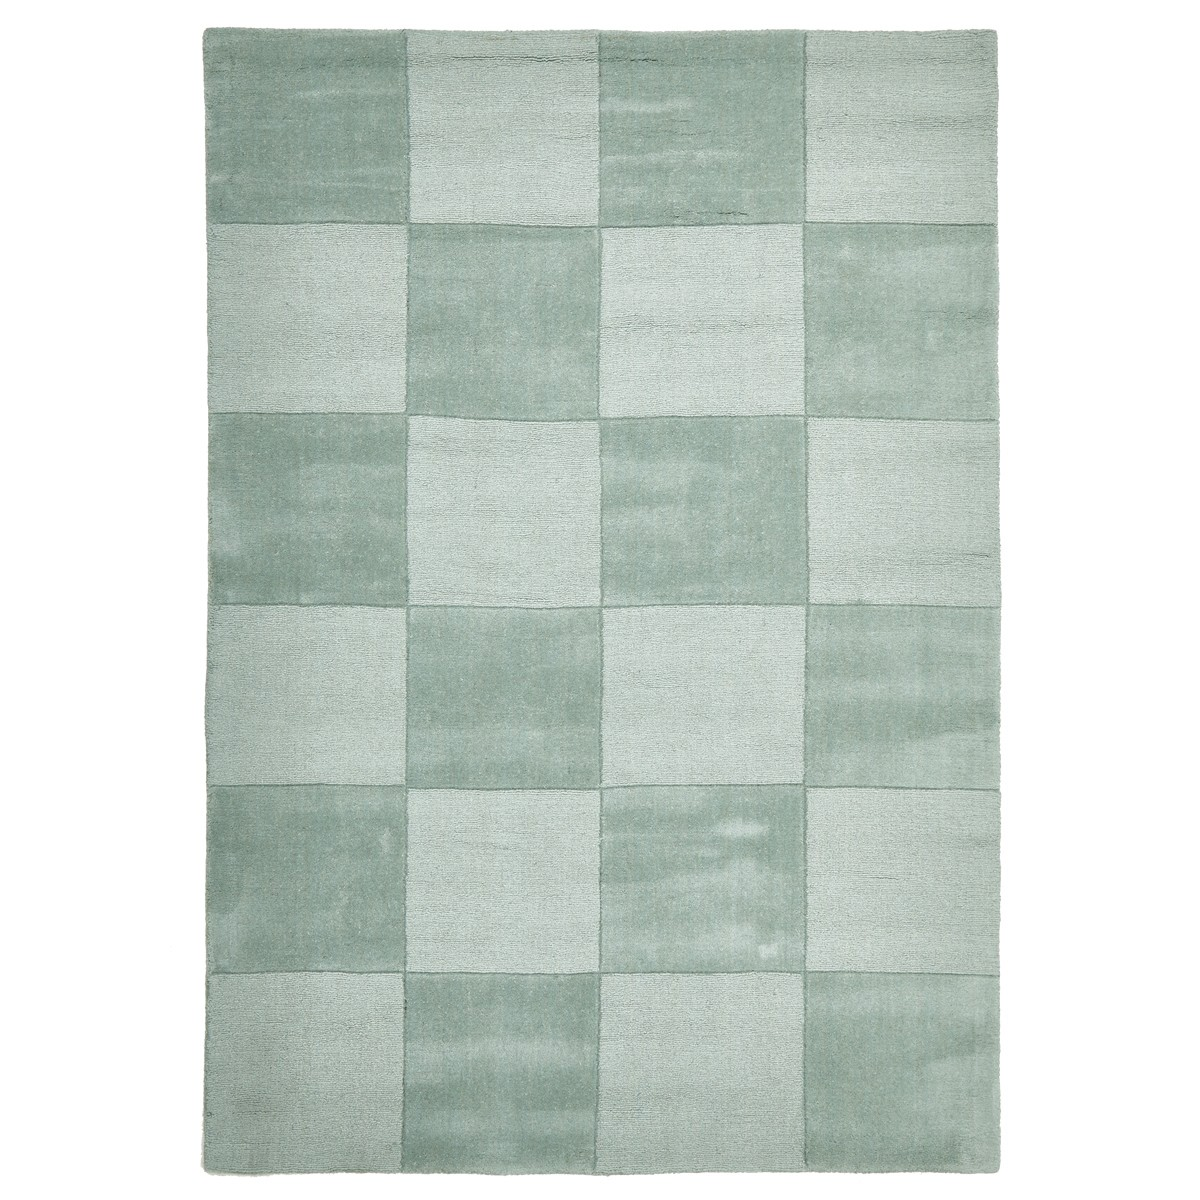 Evangeline Hand Loomed Modern Wool Rug, 165x115cm, Sage Green